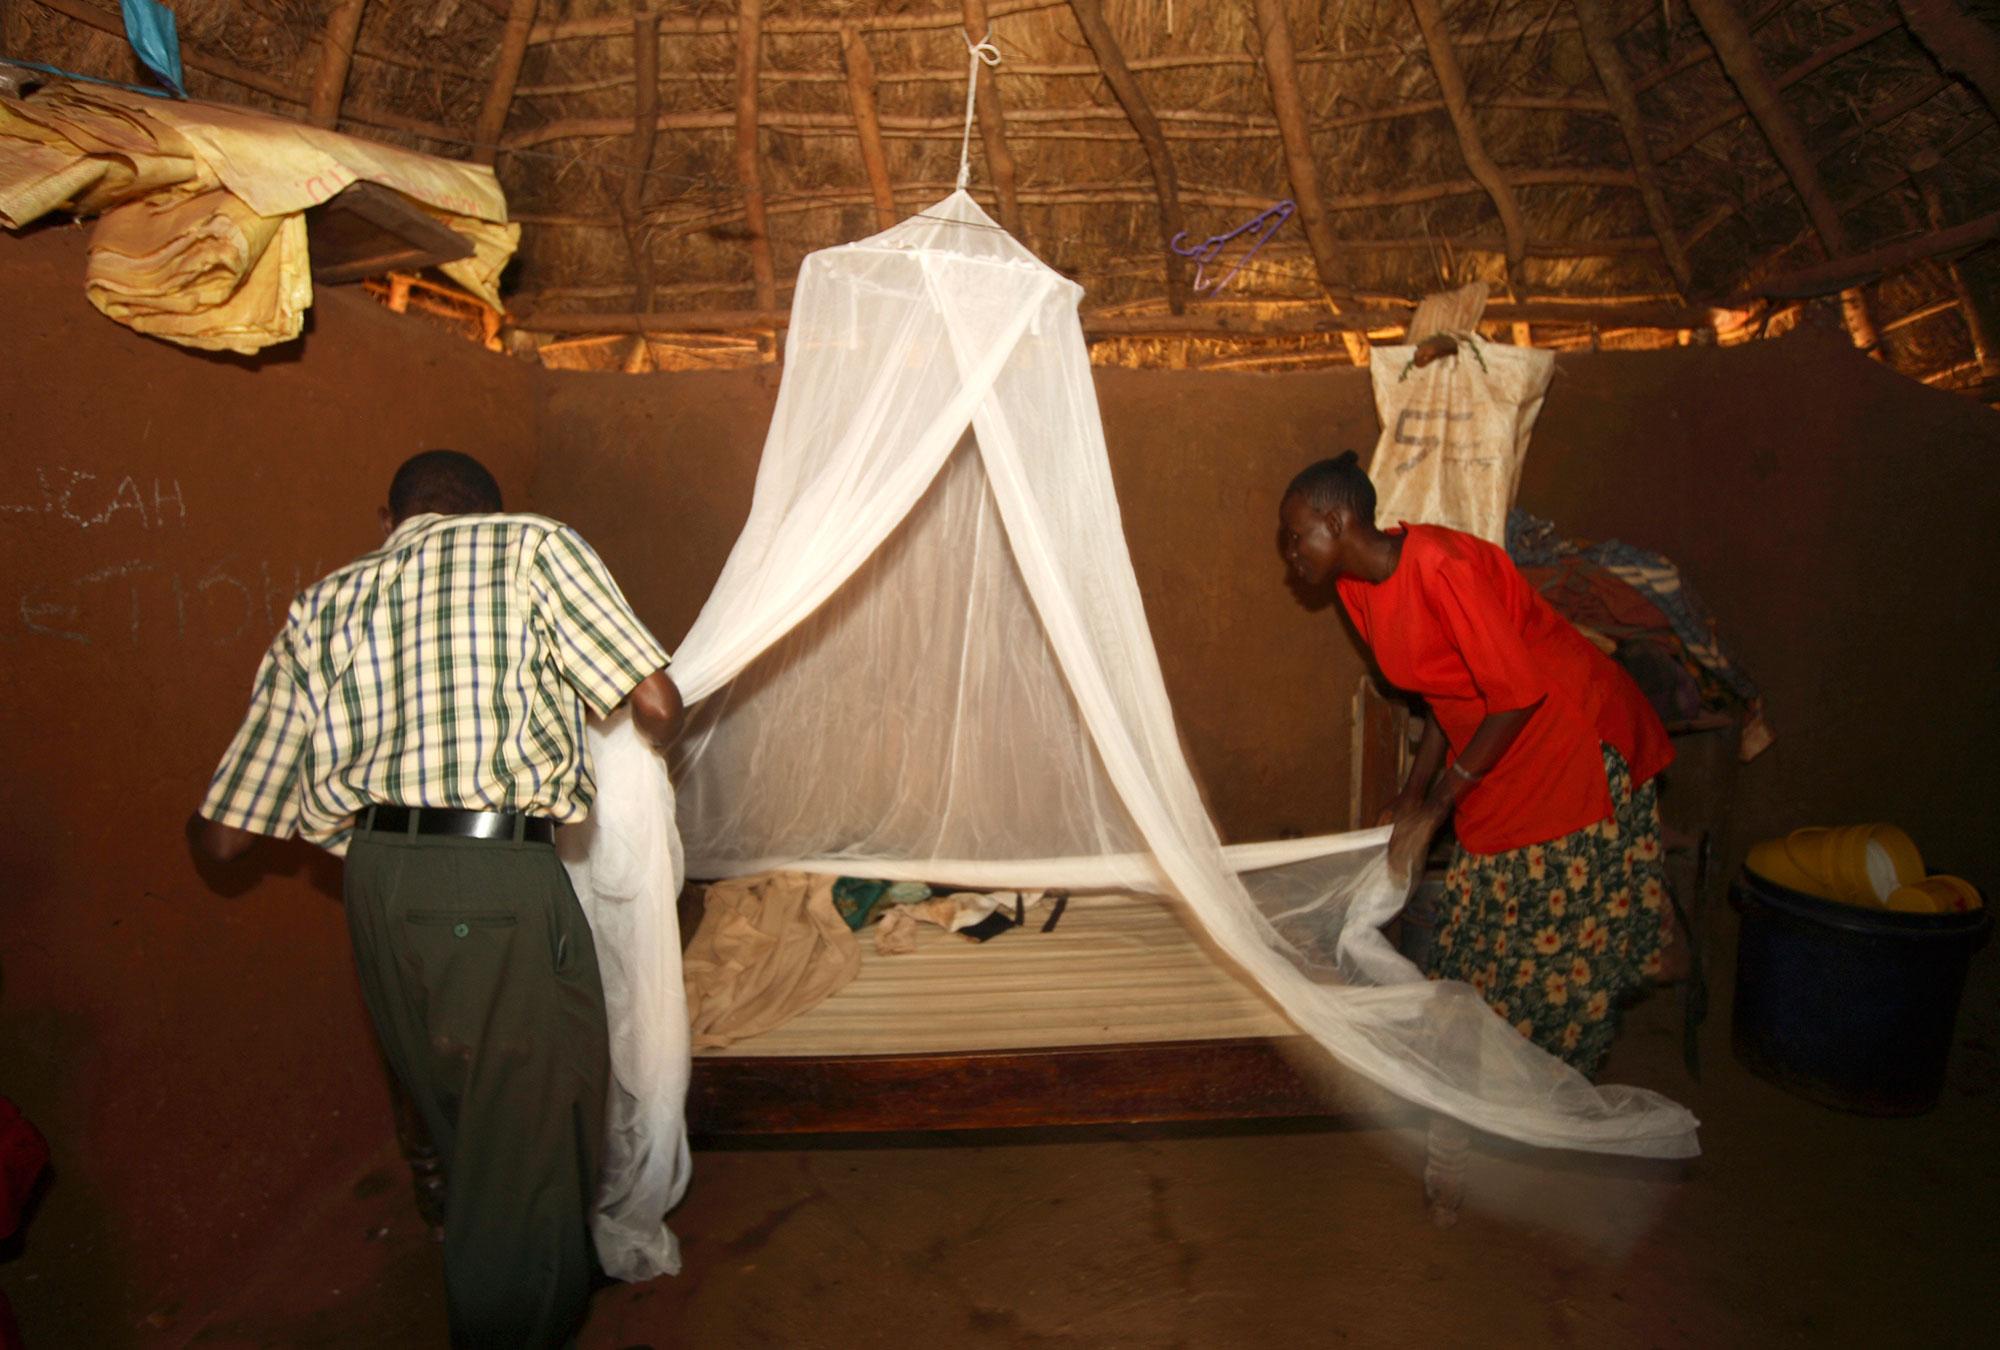 Man and woman assembling a bed net in rural Kenya.